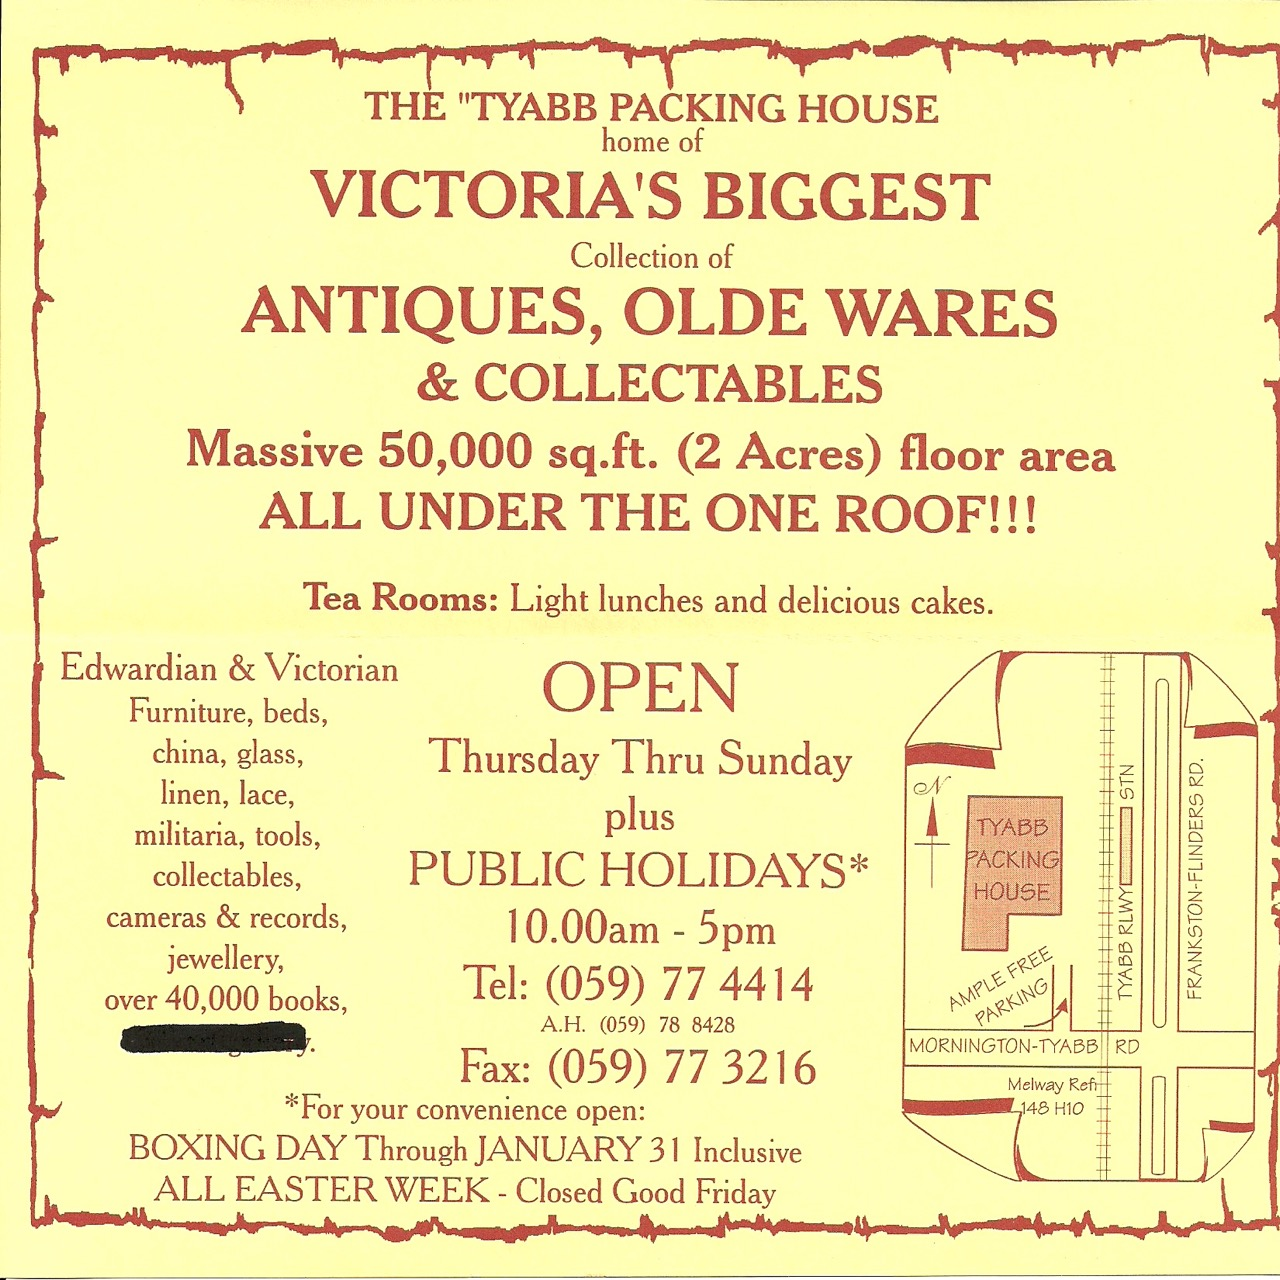 1995 interior card